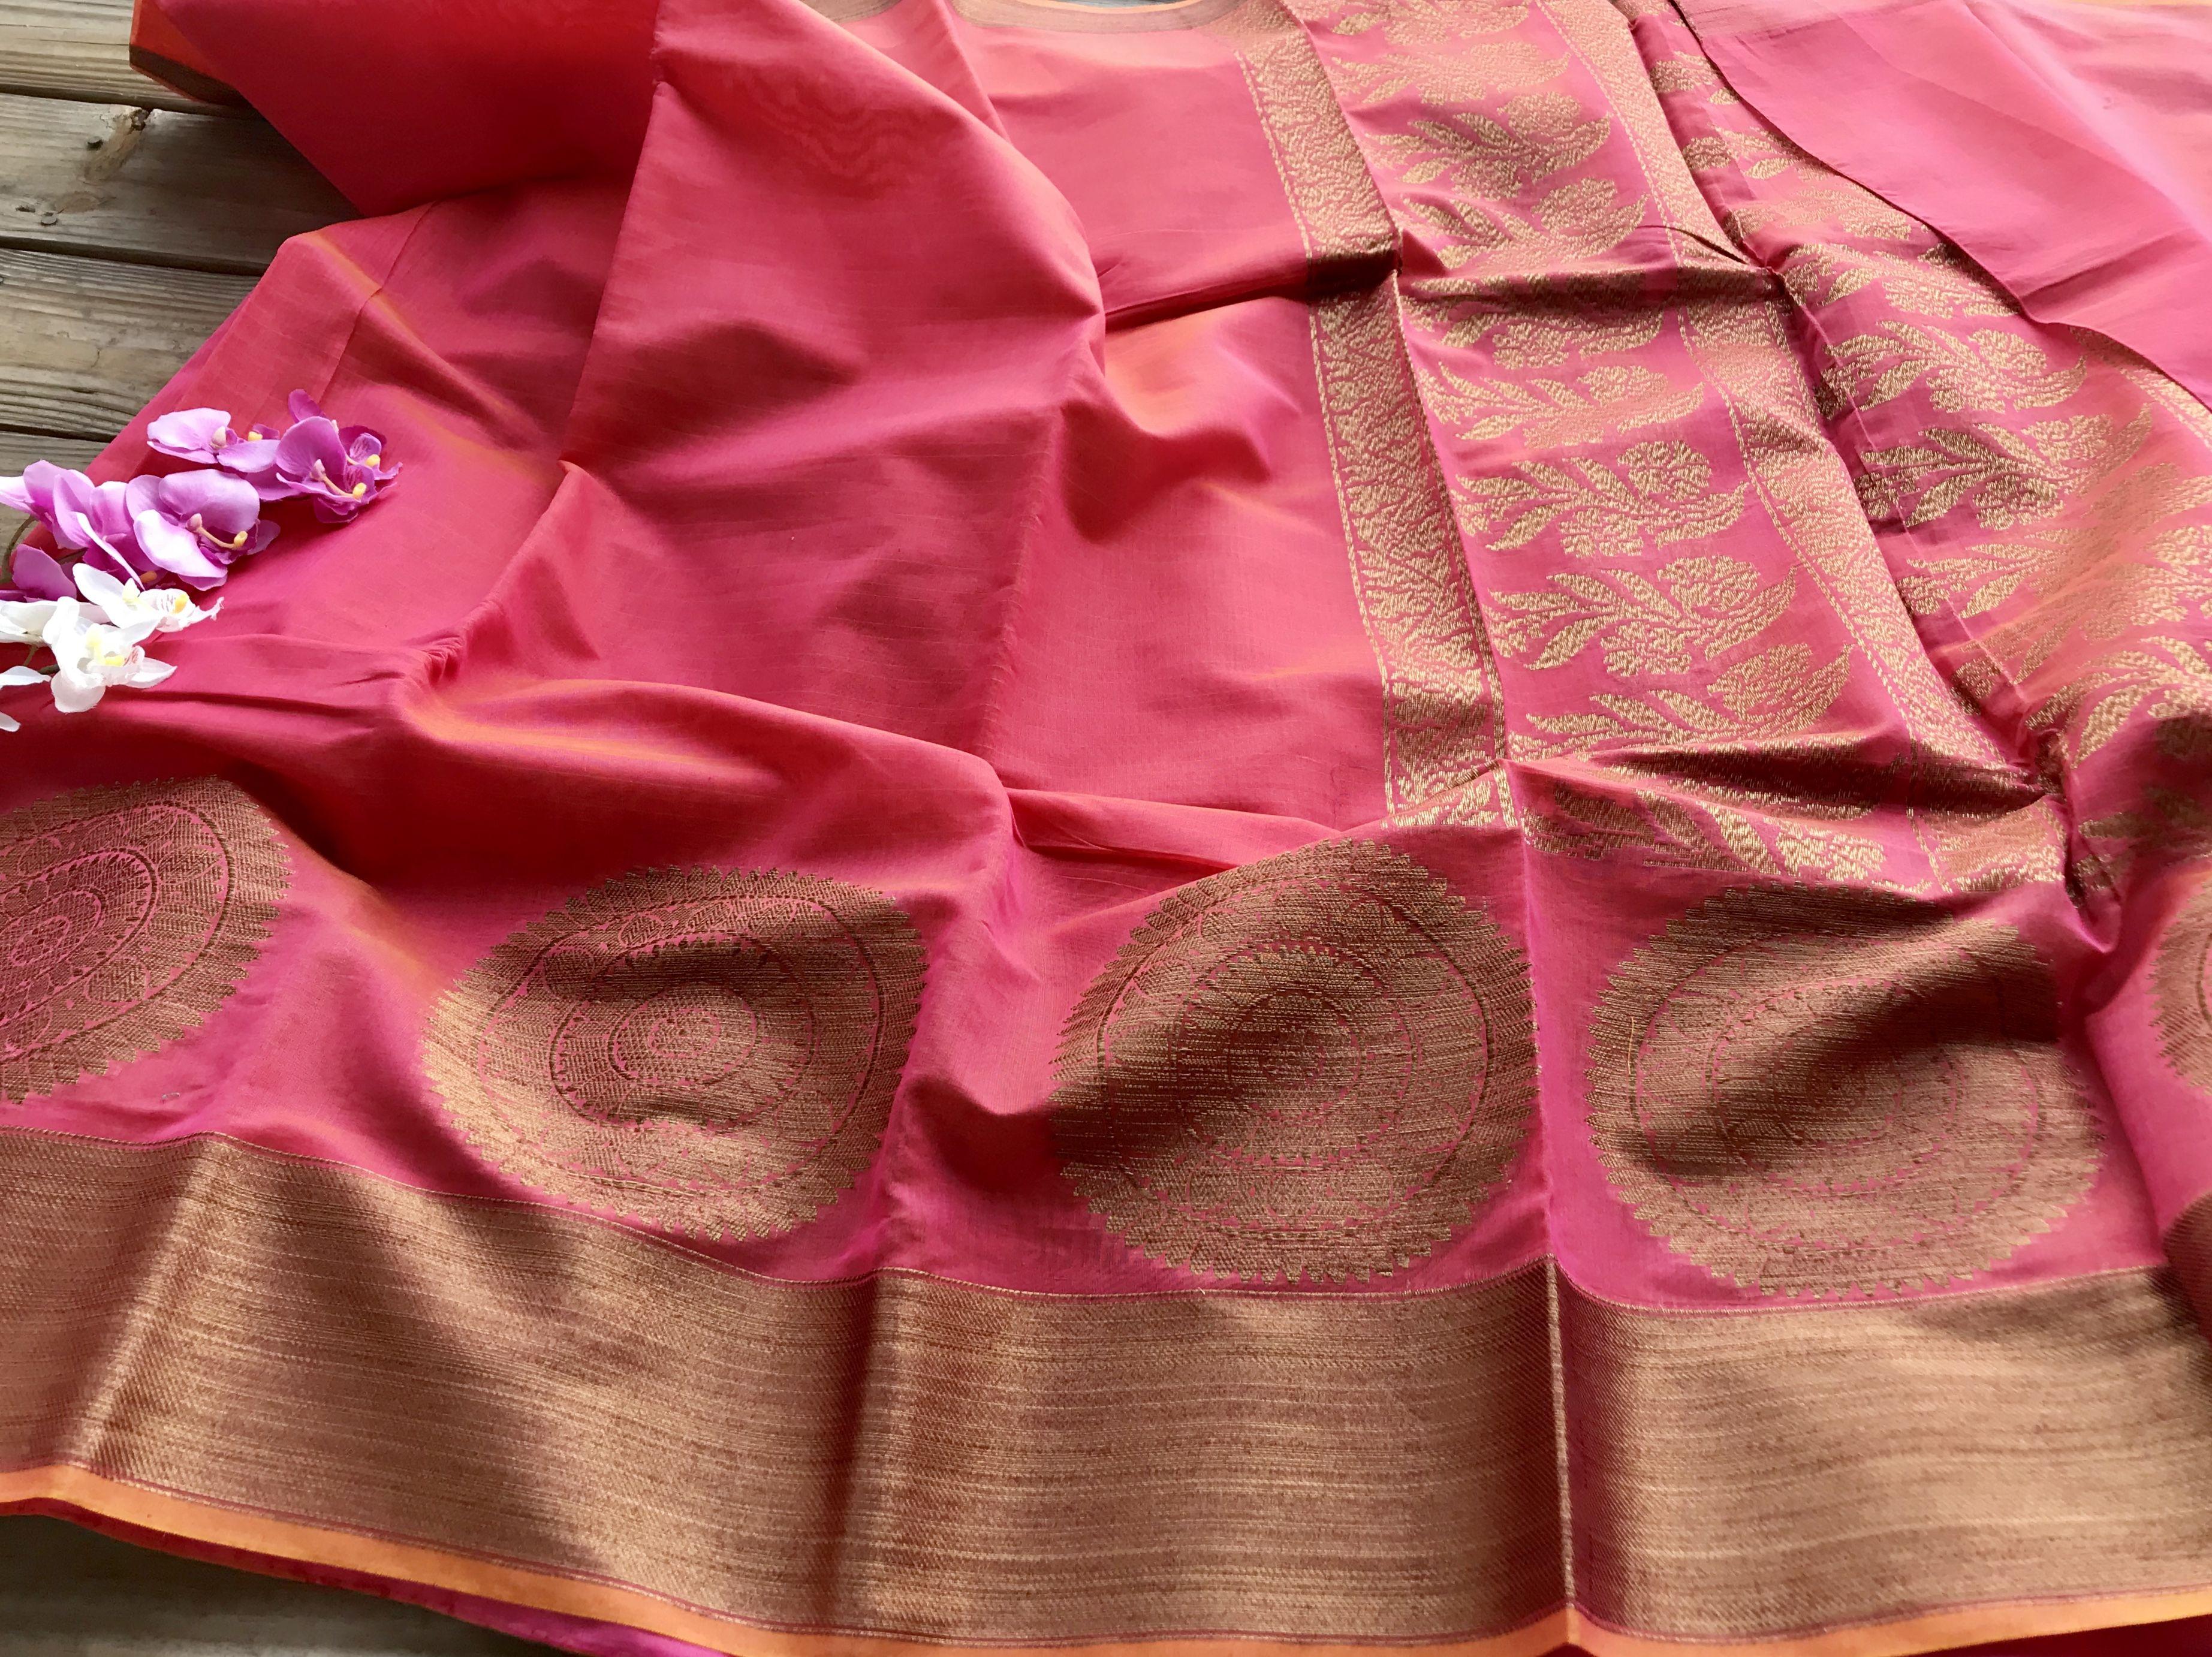 Pure Chanderi Cotton Banarasi Saree in Peach and Gold